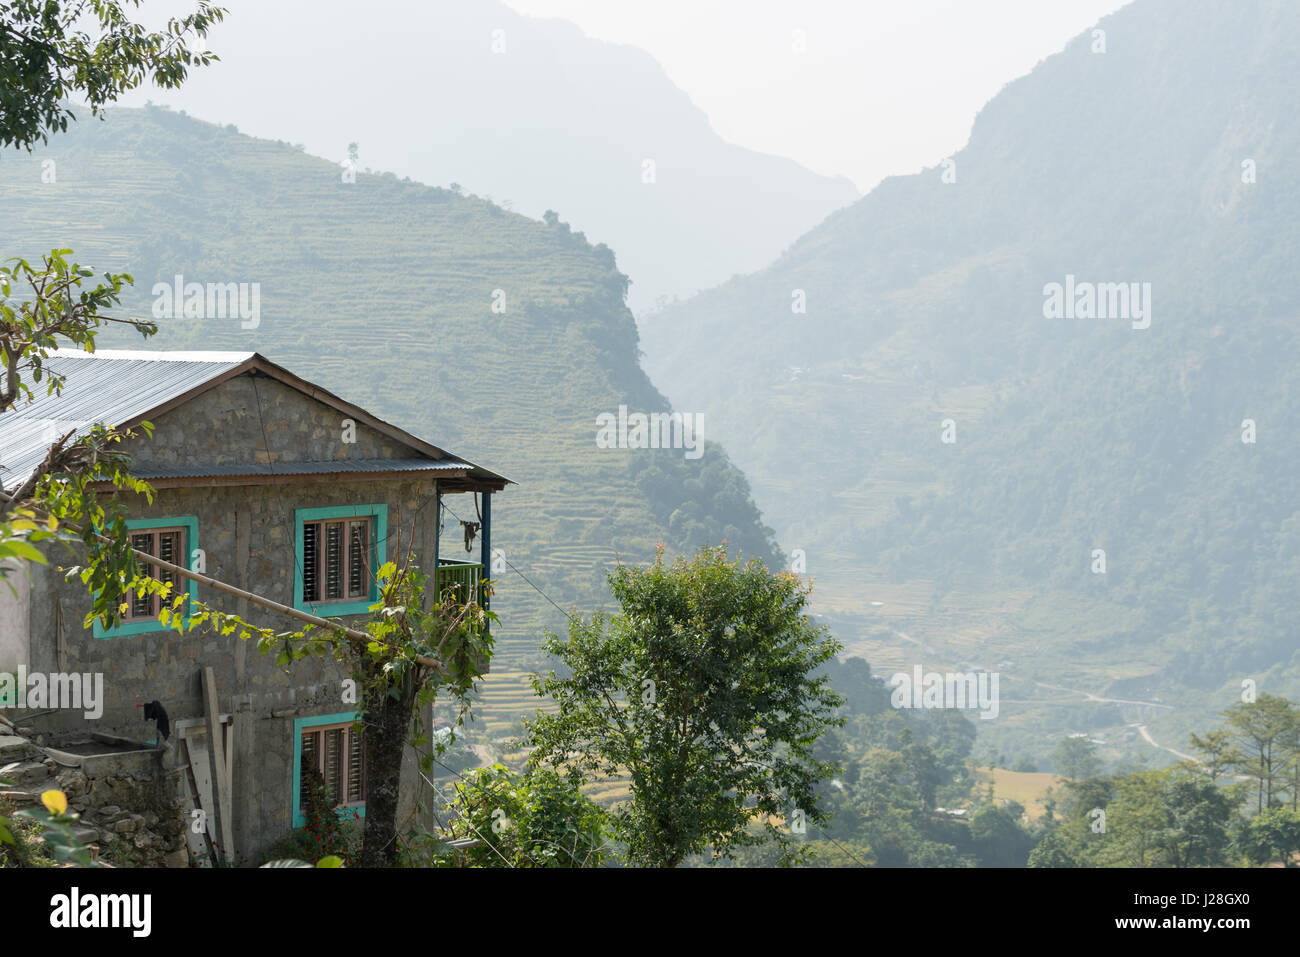 Nepal, Western Region, Bahundanda, On the Annapurna Circuit - Day 1 - Bhulbhule to Jagat - Naturalness of the house Stock Photo